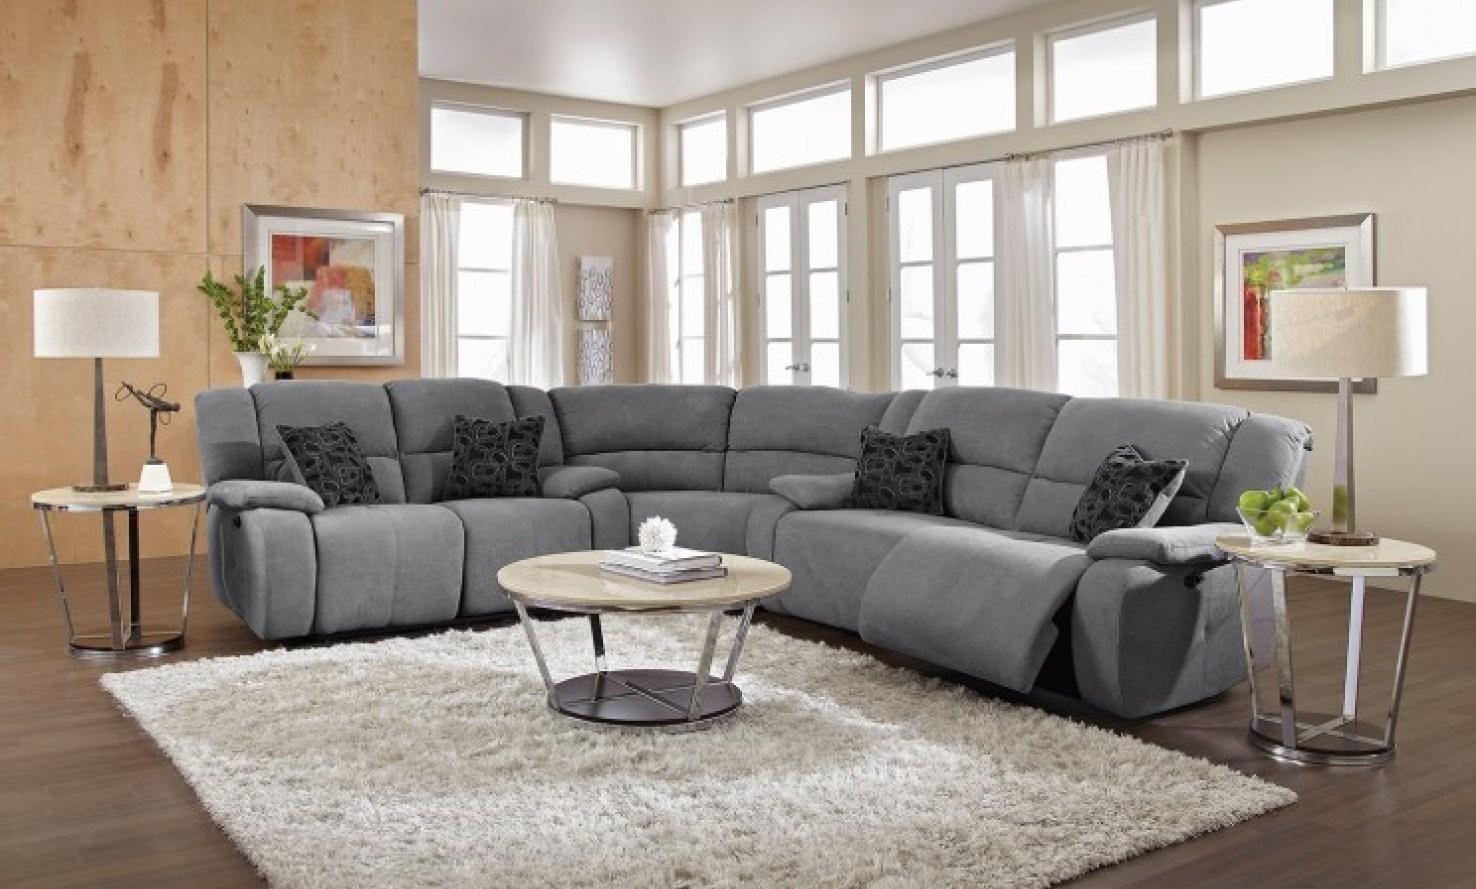 Sofa : Wonderful Deep Cushion Sofa Gallery Of The Avoiding In Deep Cushioned Sofas (View 17 of 22)